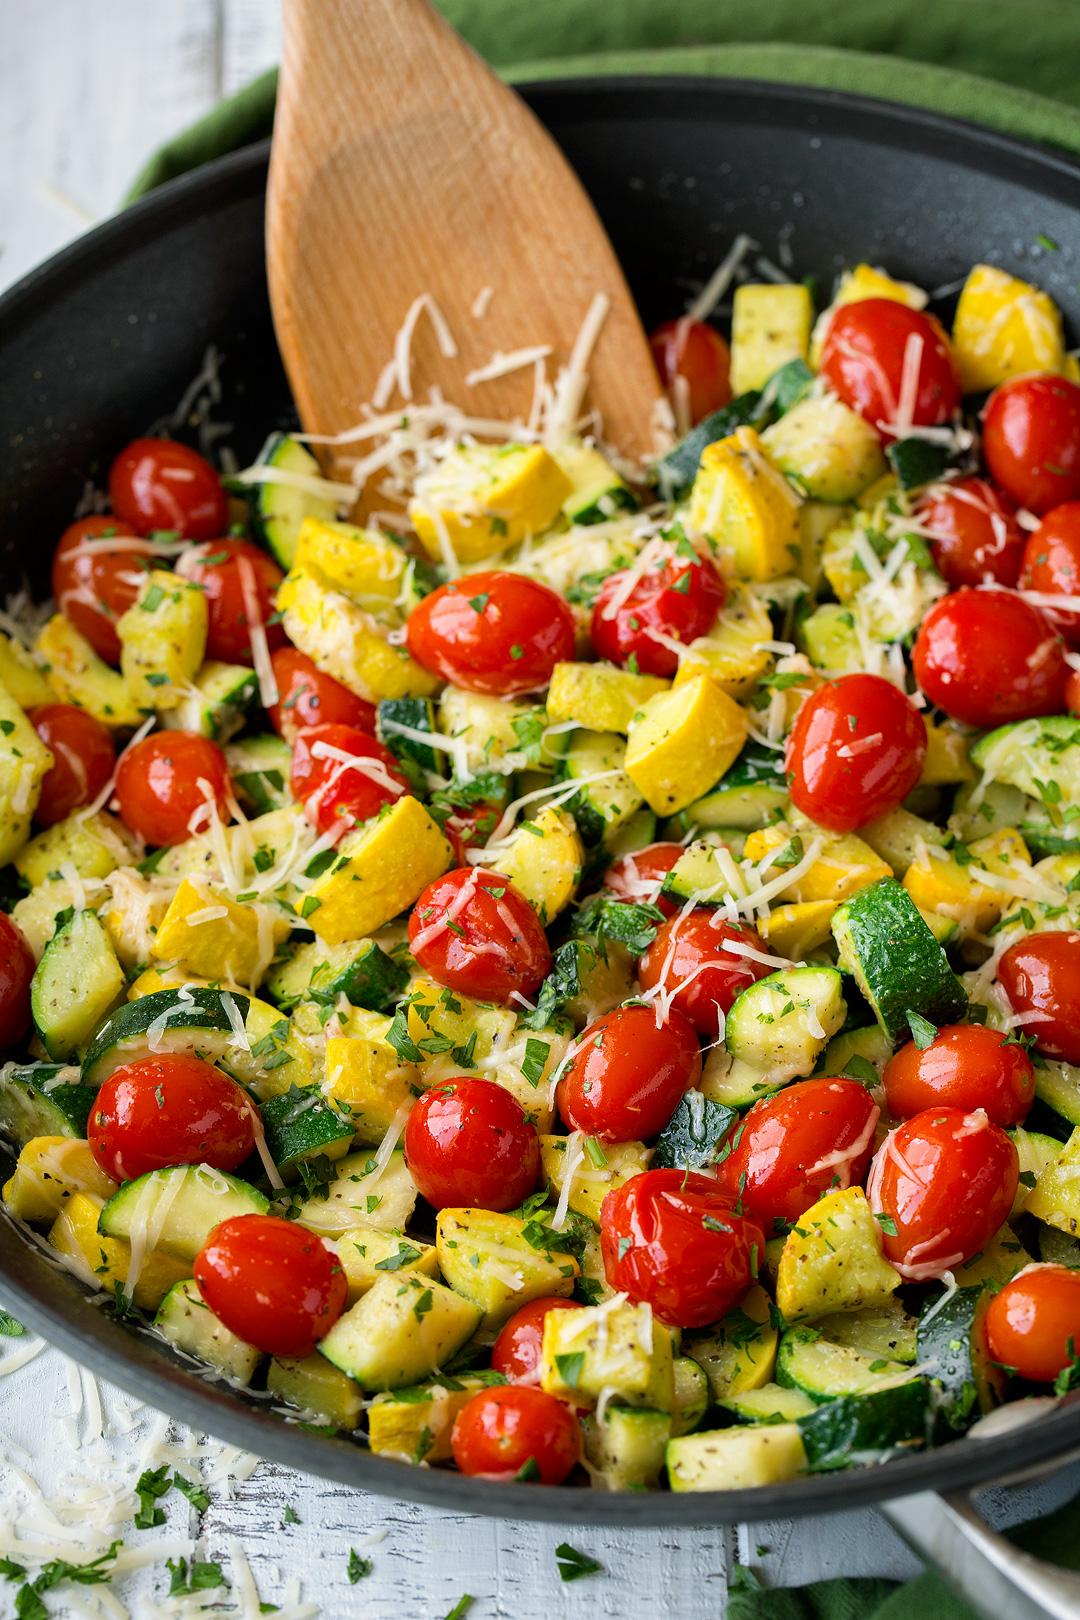 Skillet Garlic Parmesan Zucchini Squash and Tomatoes